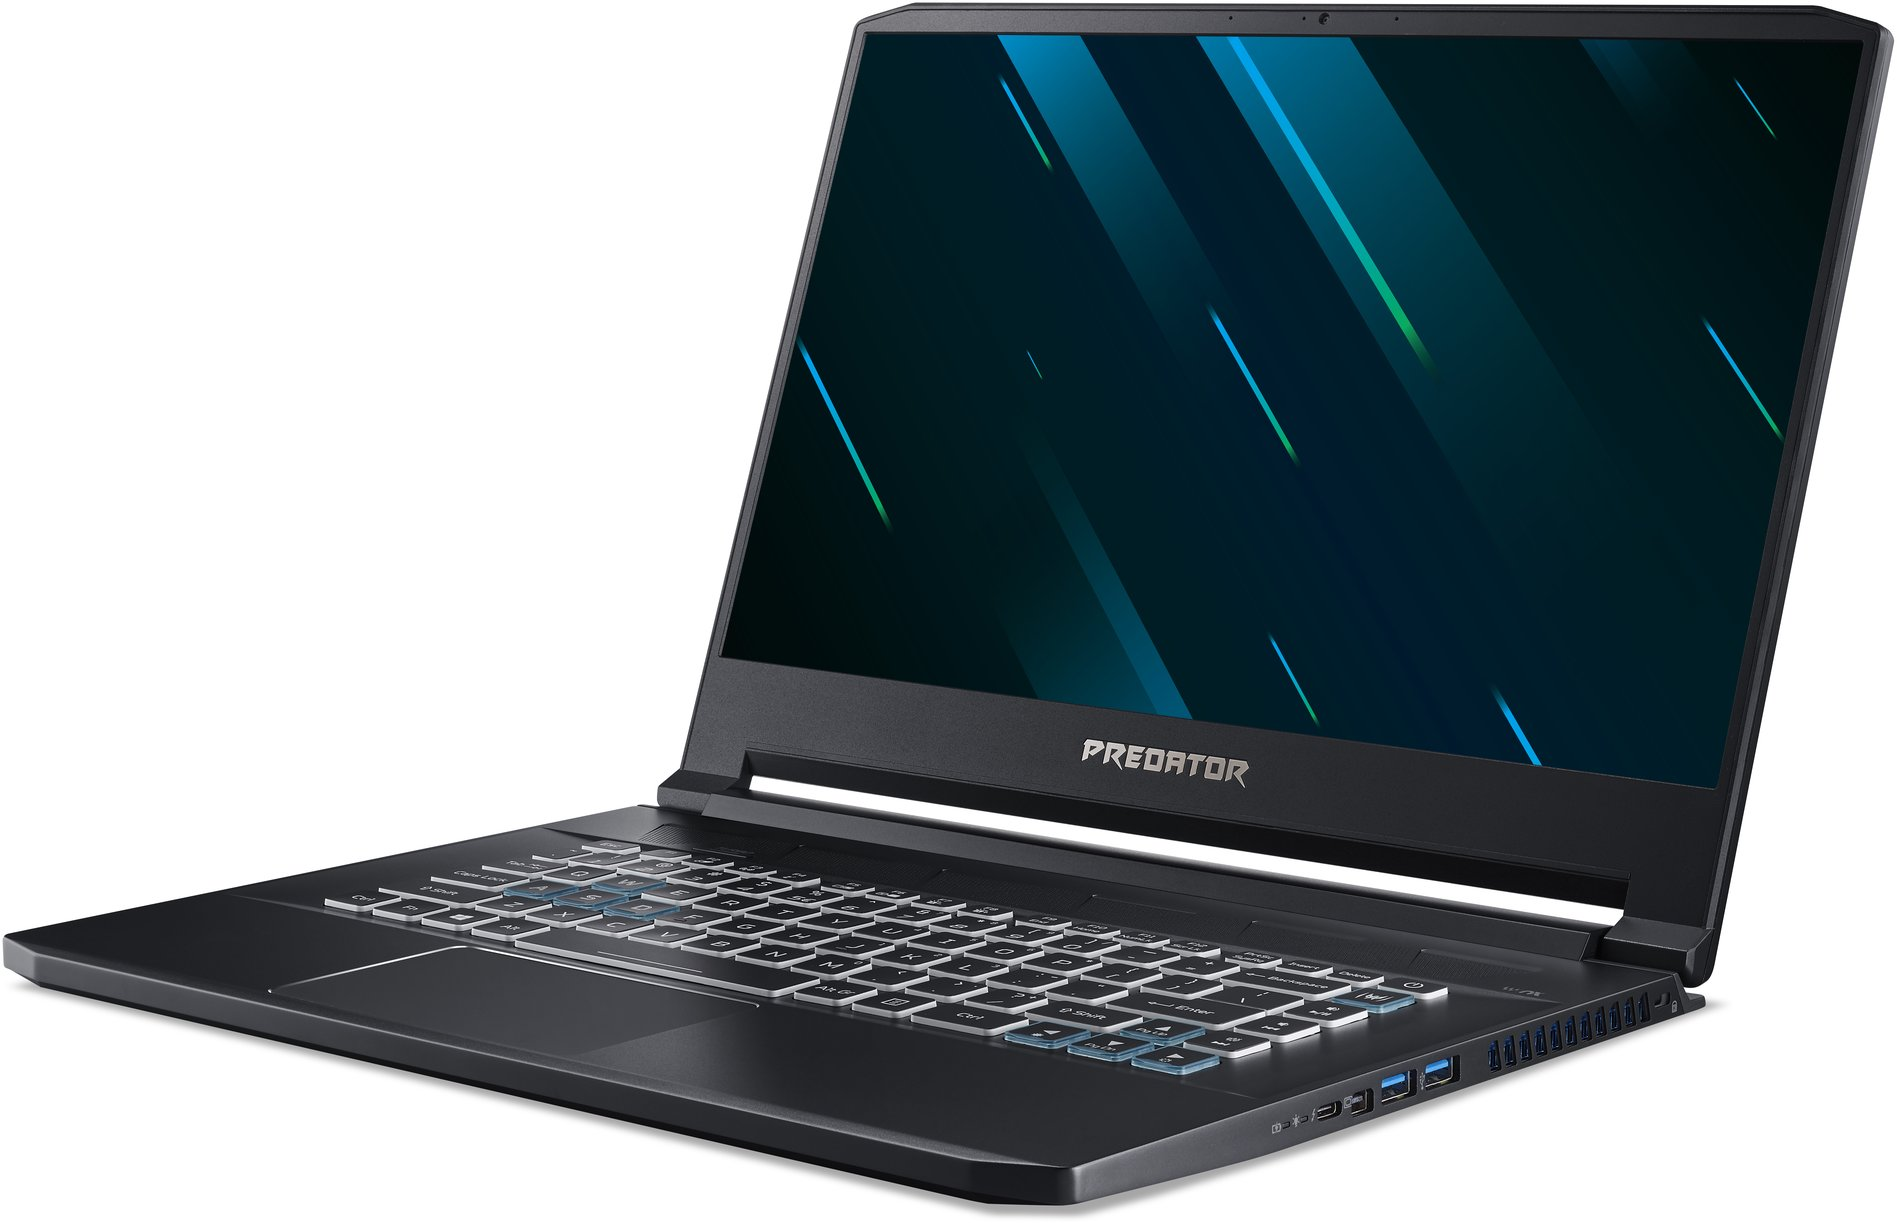 Acer Predator Triton 500 PT515-51-71PZ